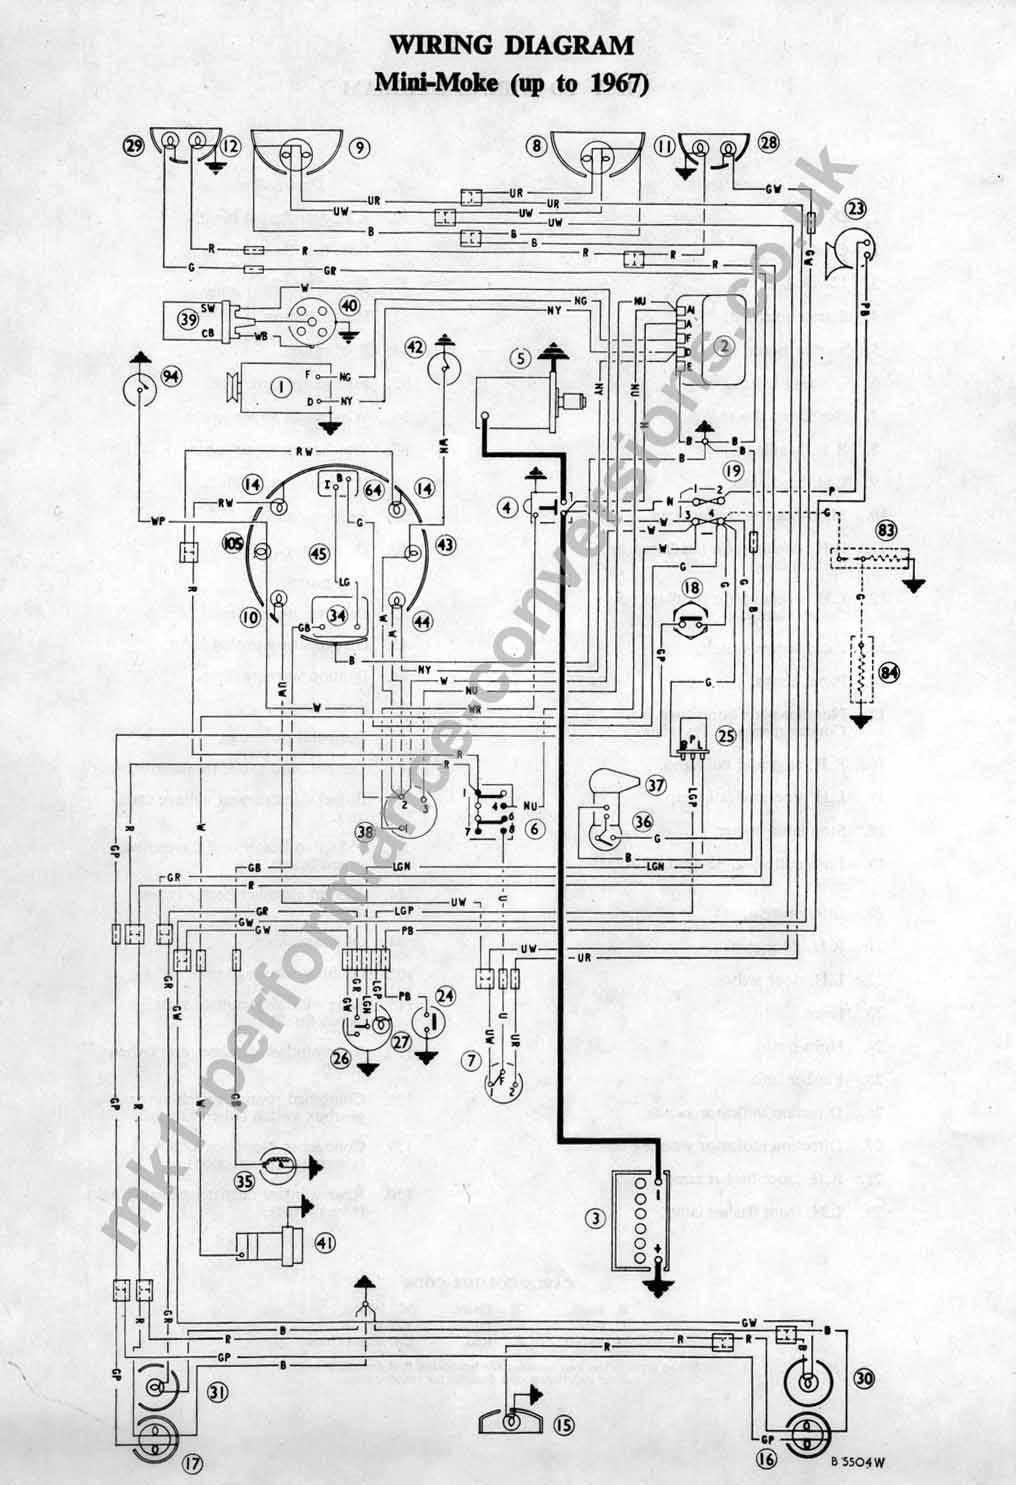 fv_2325] morris minor wiring diagram furthermore morris minor ... 1969 mini cooper wiring diagram 1969 camaro engine wiring diagram tzici mepta mohammedshrine librar wiring 101